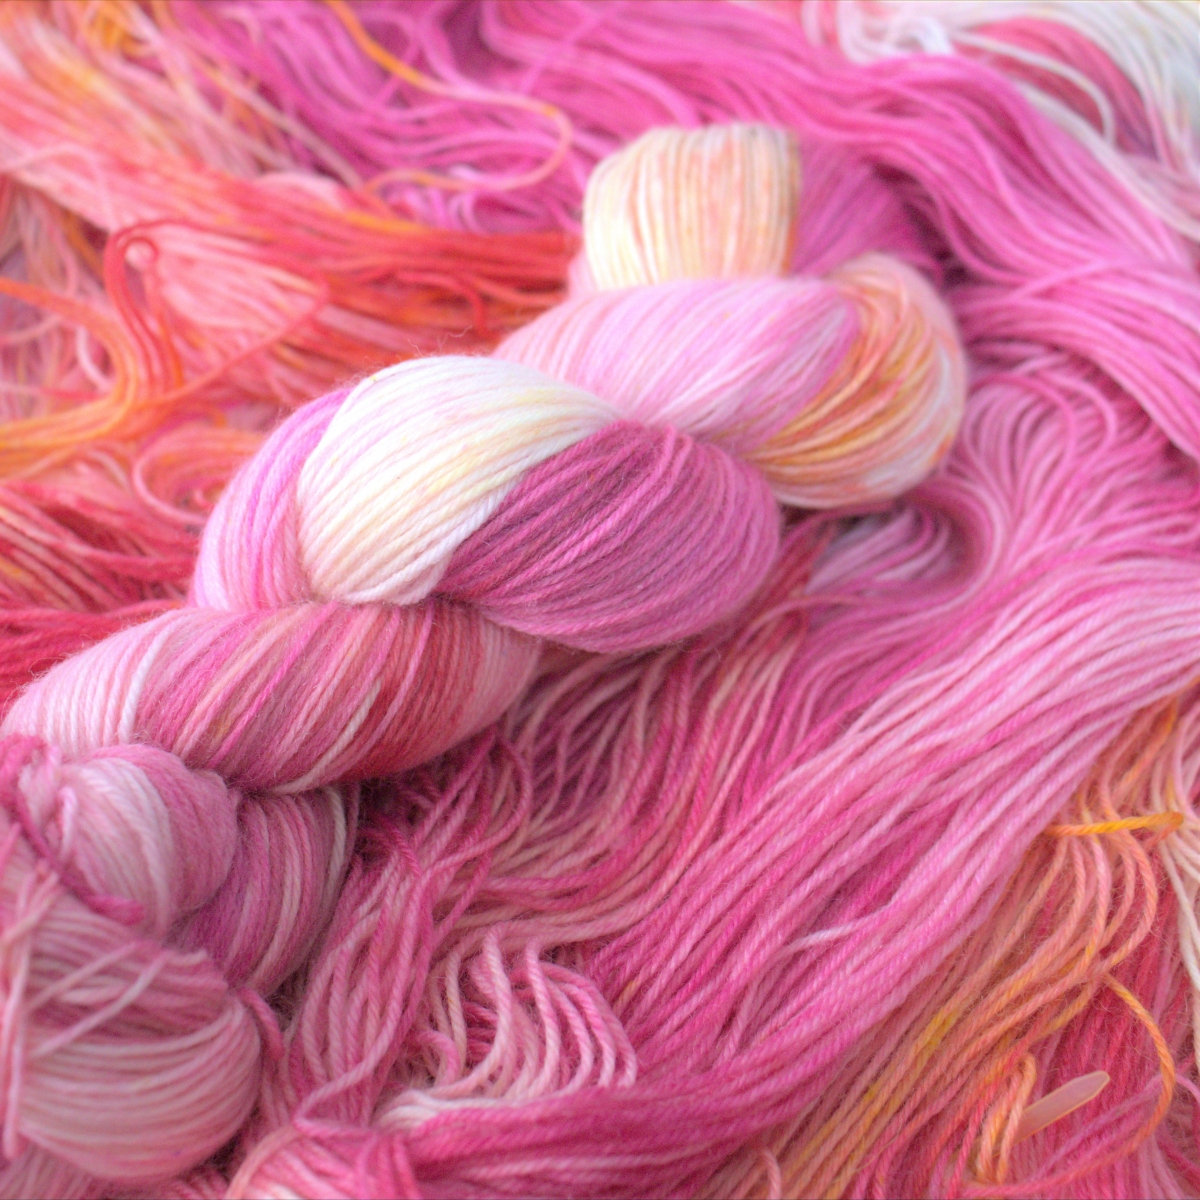 woodico.pro hand dyed yarn 052 copy 1200x1200 - Hand dyed yarn / 053